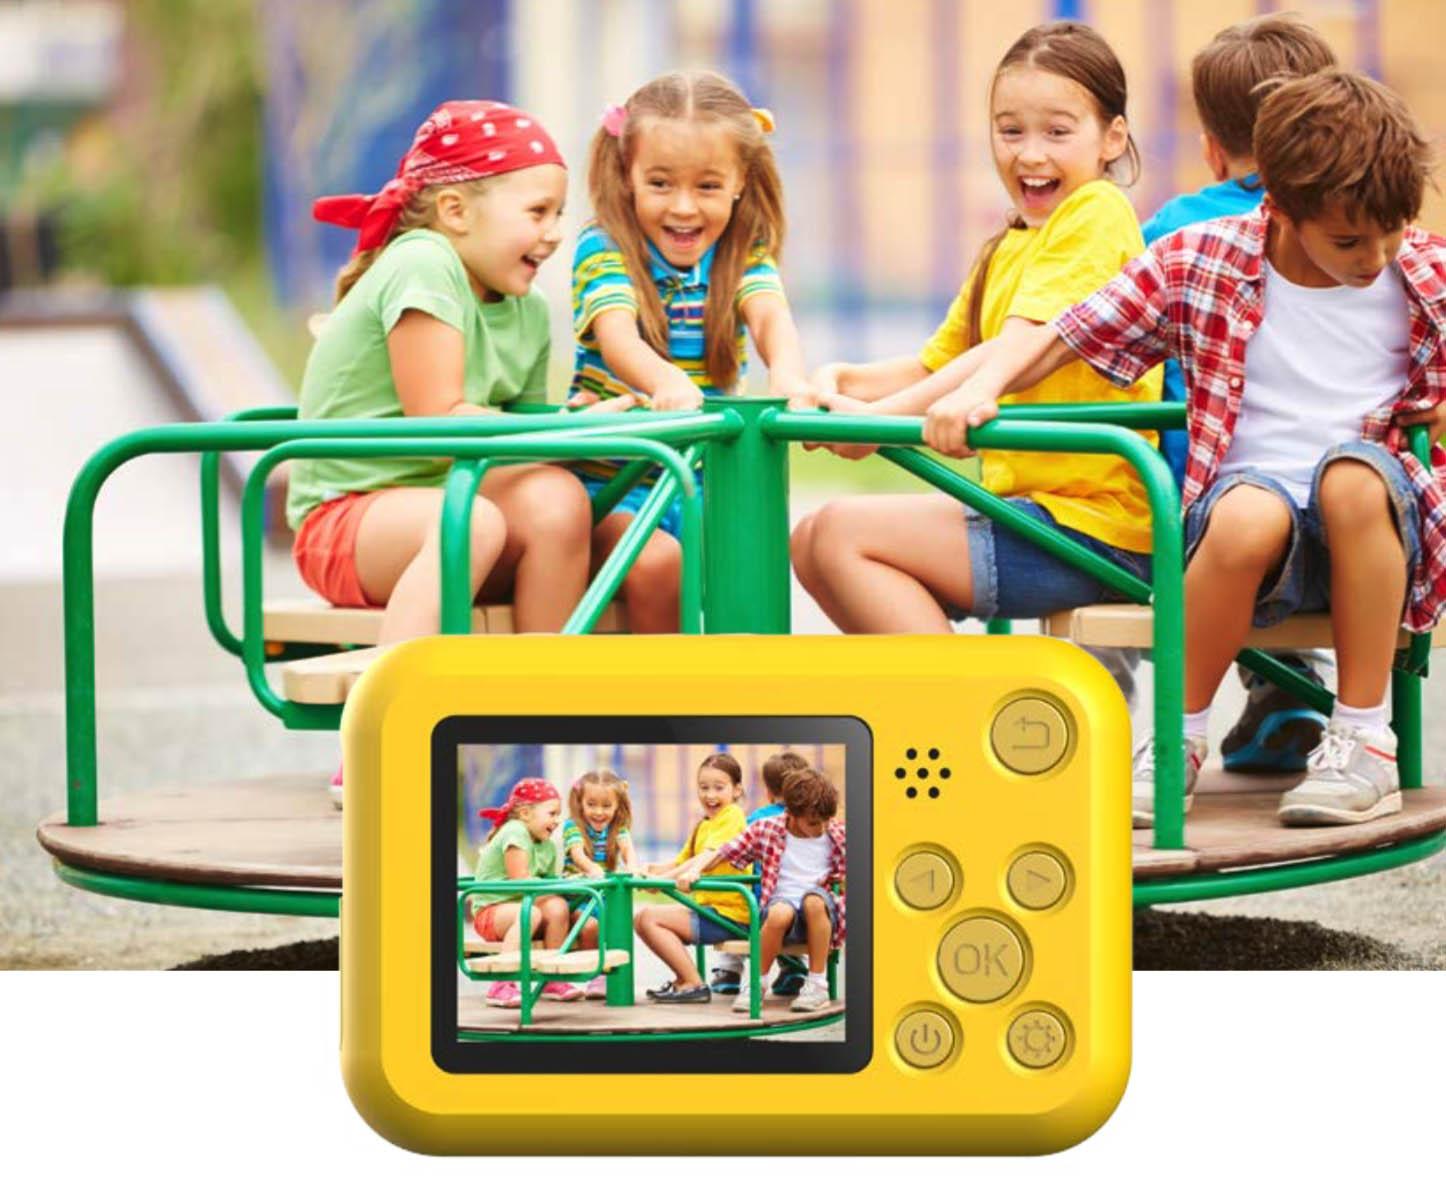 funcam-kids-hd-camera-features-3.jpg